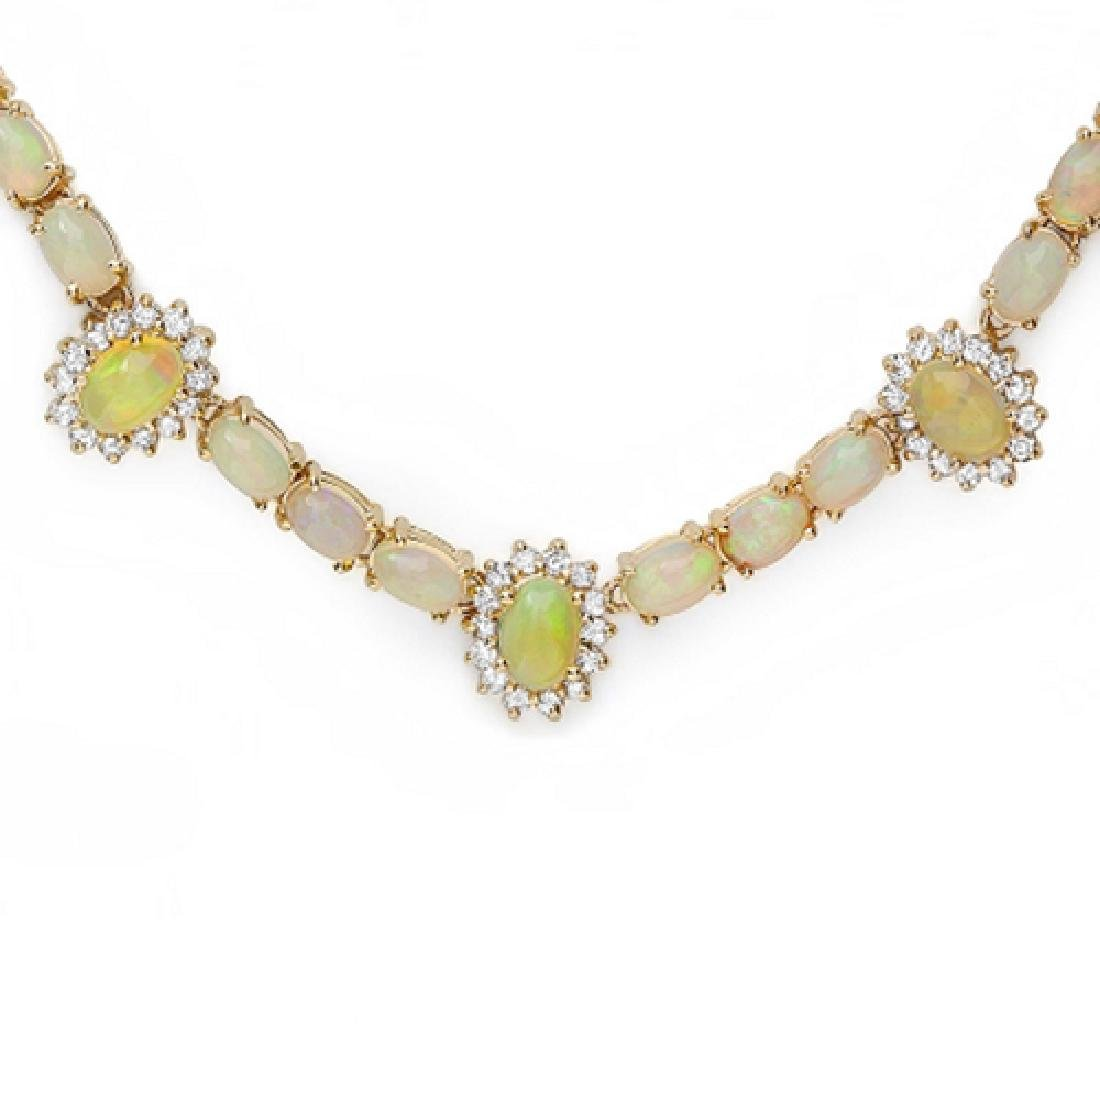 24.86 Carat Natural Opal 18K Solid Yellow Gold Diamond - 2